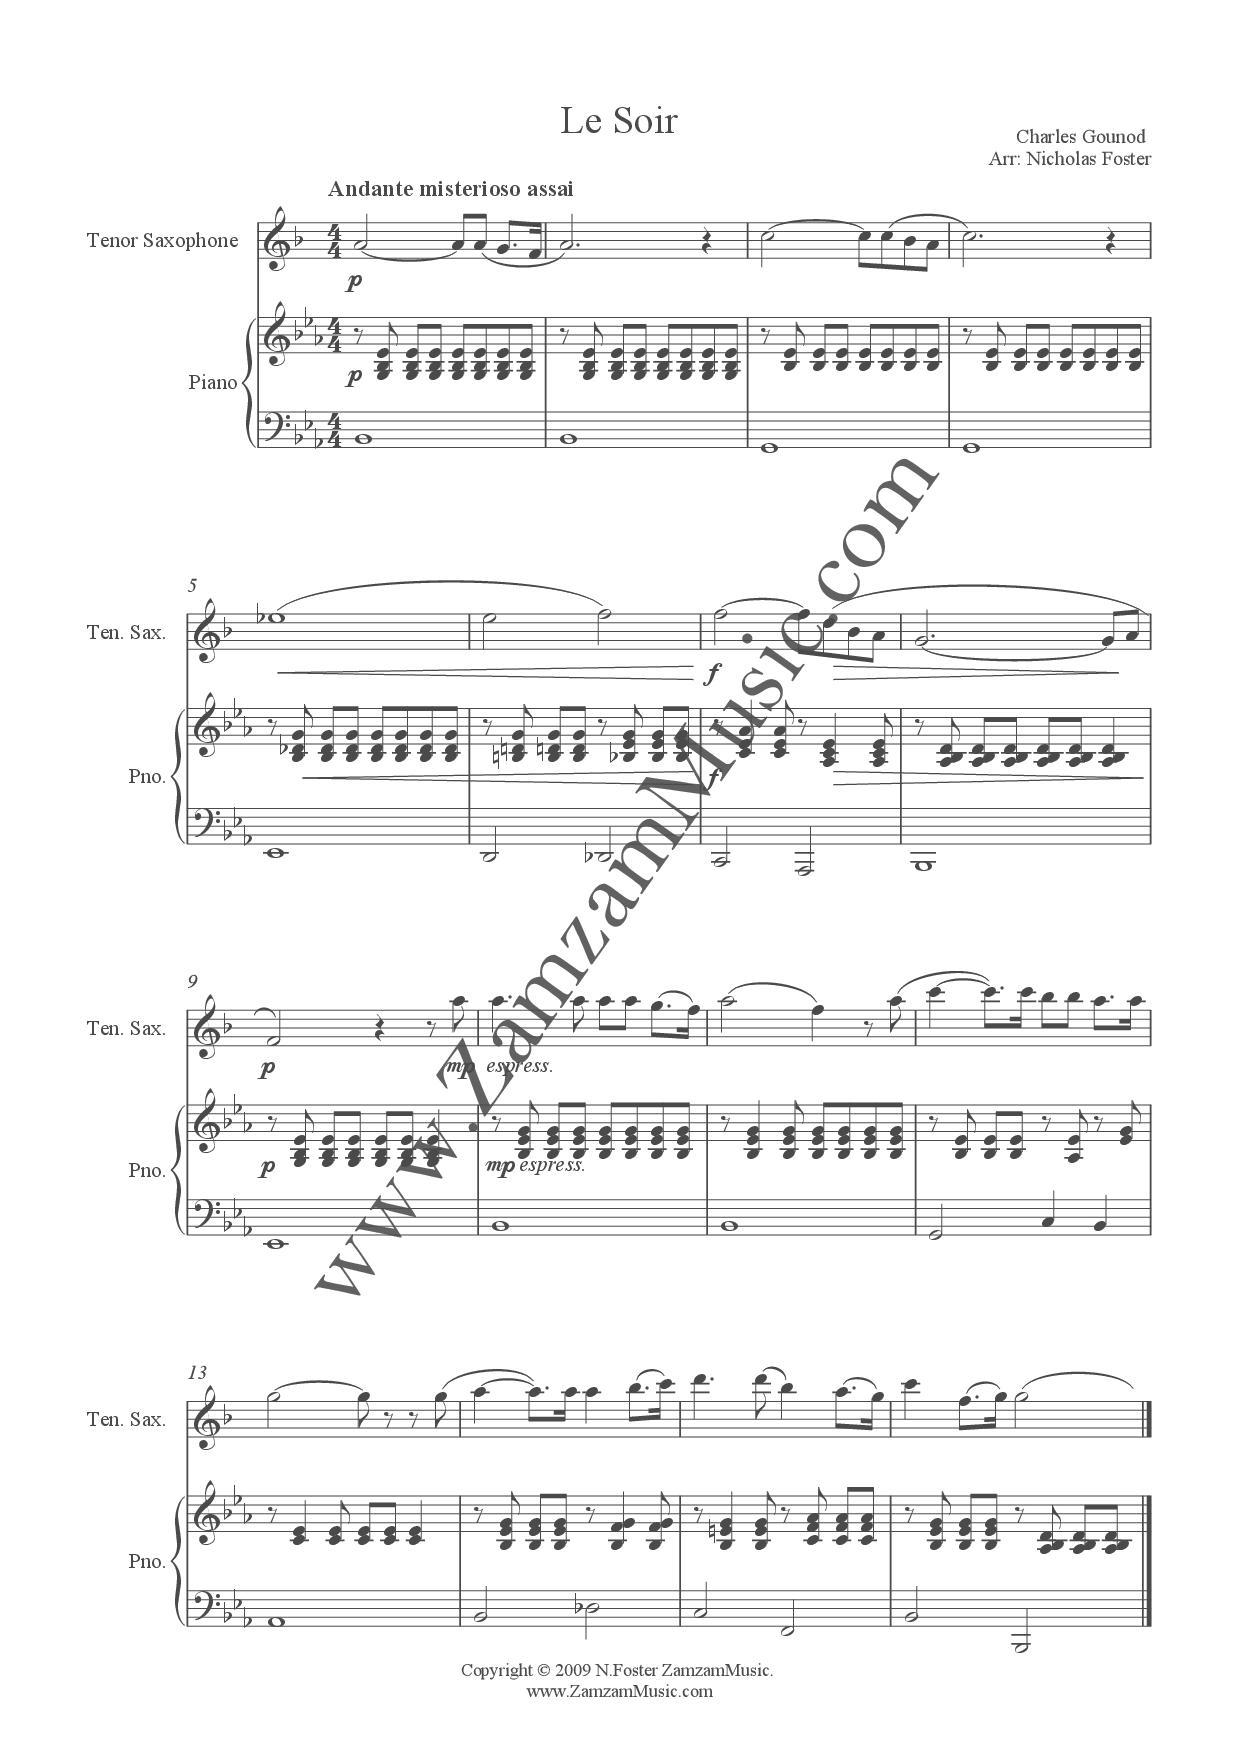 Gounod - Le Soir  A song arranged for Tenor Saxophone and Piano